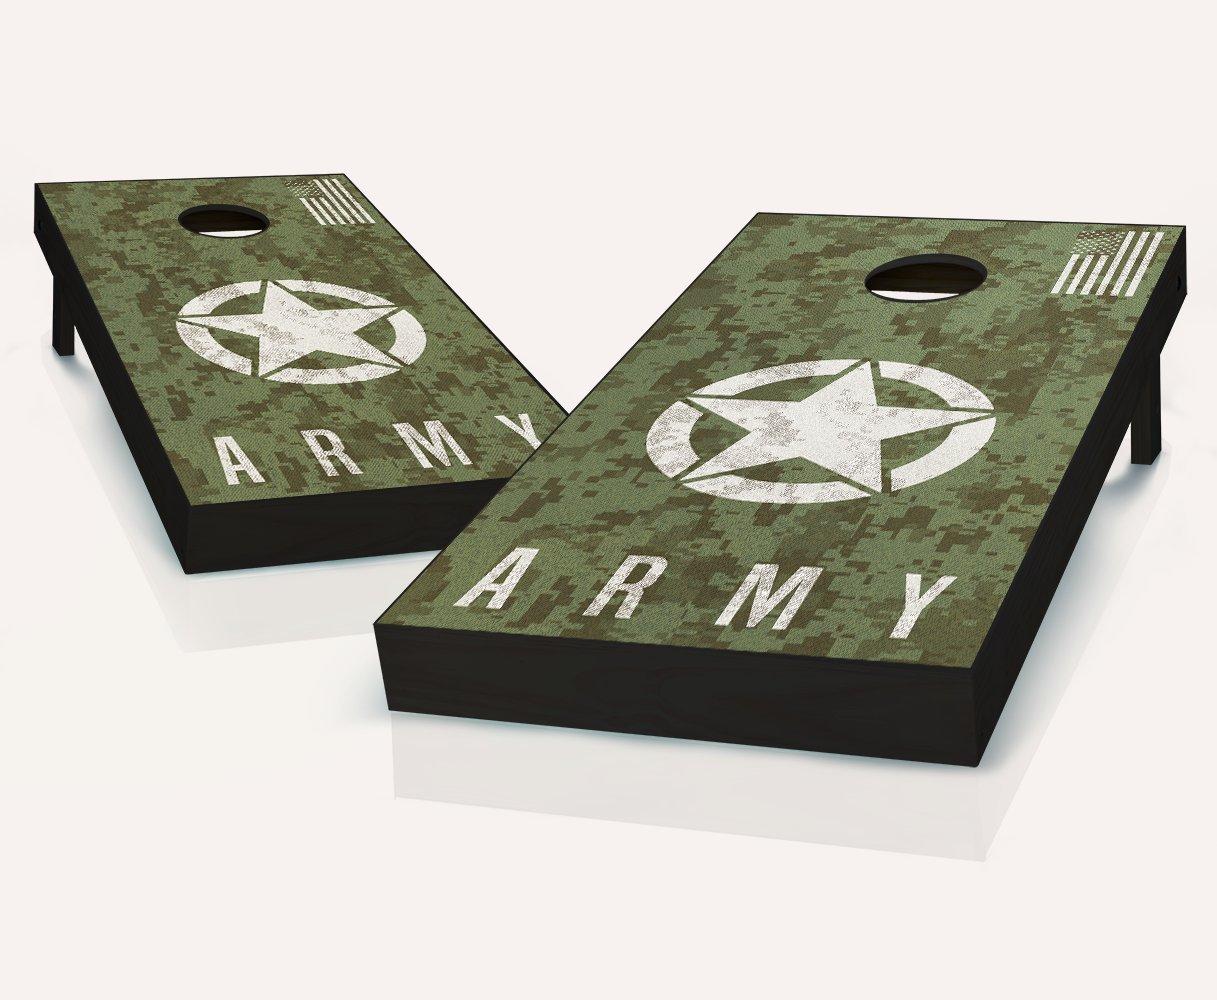 Tailgating Pros US Army Digital Camo Cornhole Boards with Set of 8 Cornhole Bags